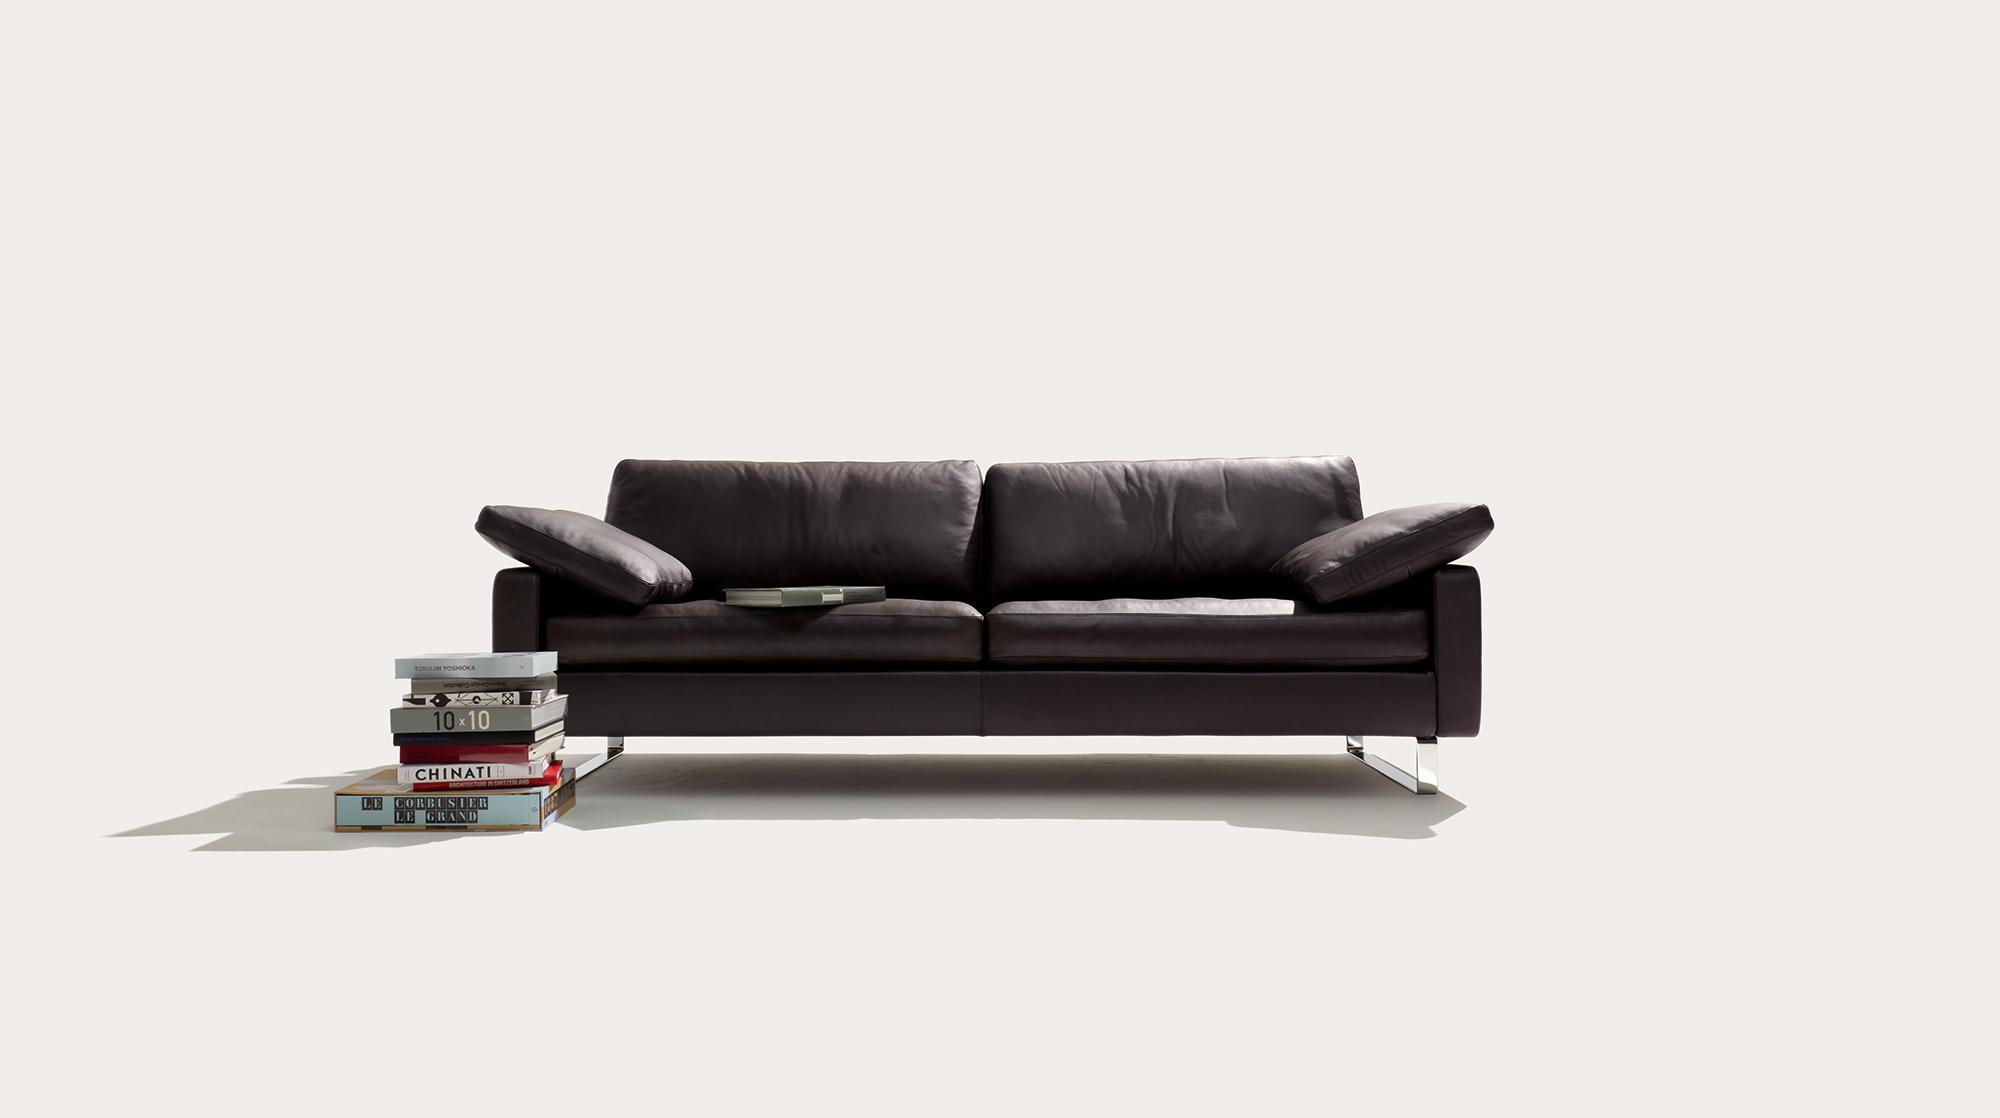 Full Size of Goodlife Sofa Malaysia Amazon Love Furniture Signet Couch Good Life Polstermbel Mbel Morschett Marken Big Xxl Lagerverkauf Mit Bettkasten Sam 3 2 1 Sitzer Sofa Goodlife Sofa